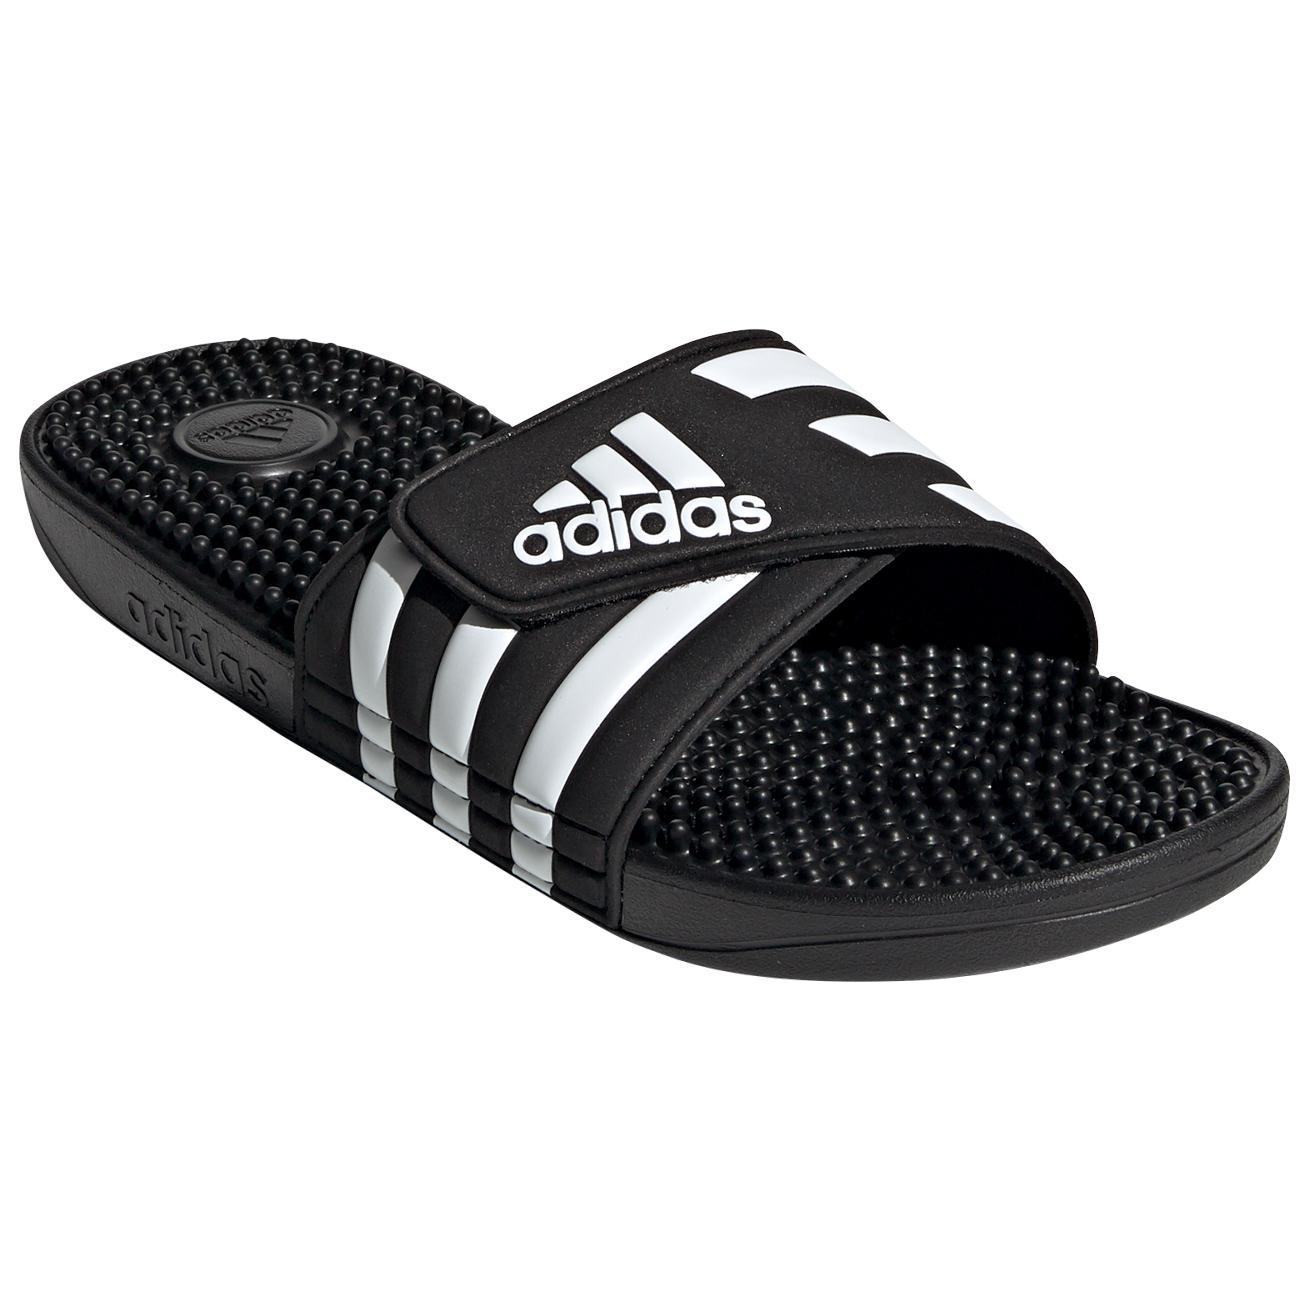 a65e3b7ef60e Adidas Adissage - Sandals Men s